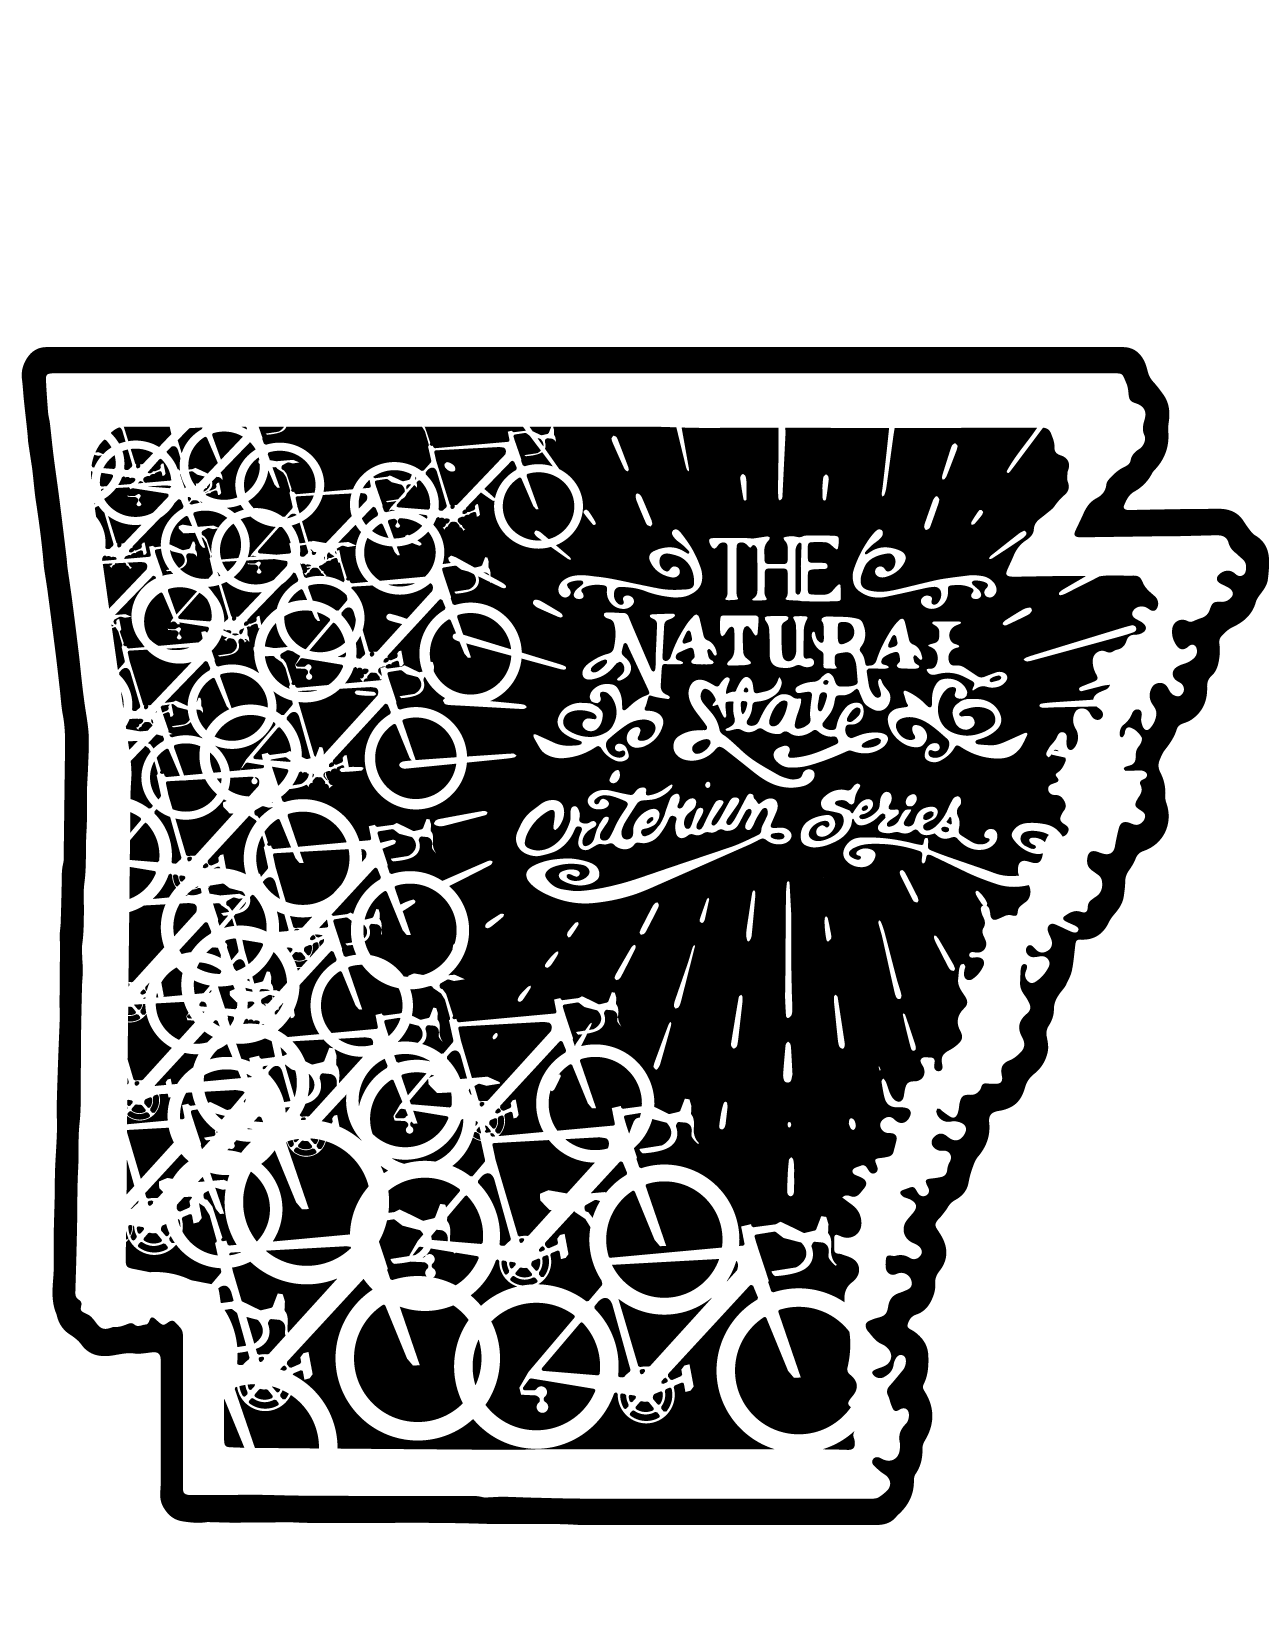 Natural State Criterium Series